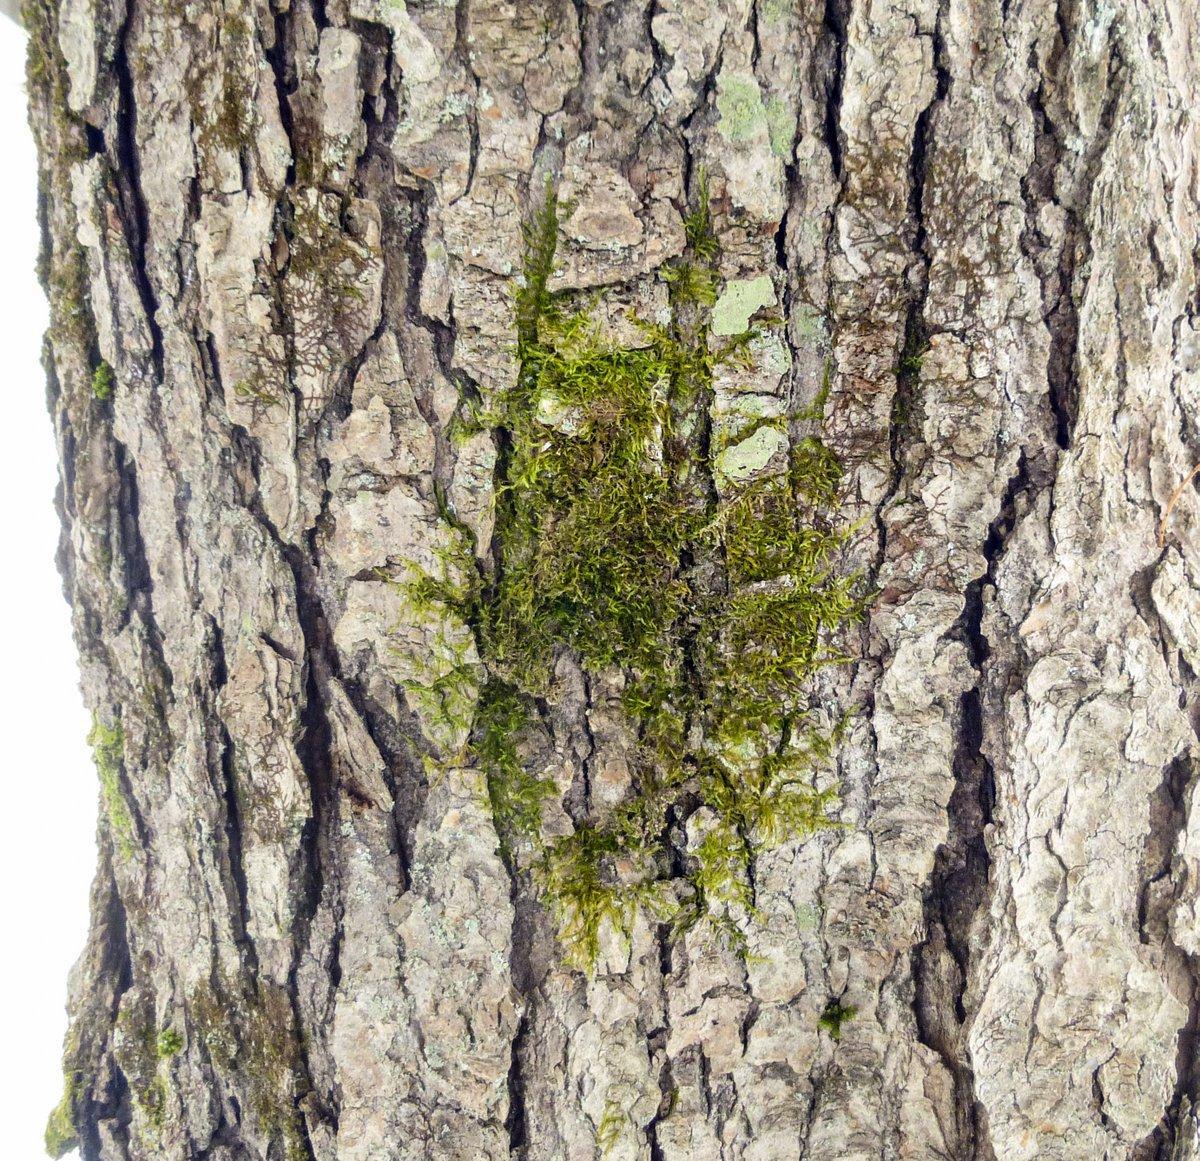 4. Stalked Feather Moss aka Brachythecium rutabulum